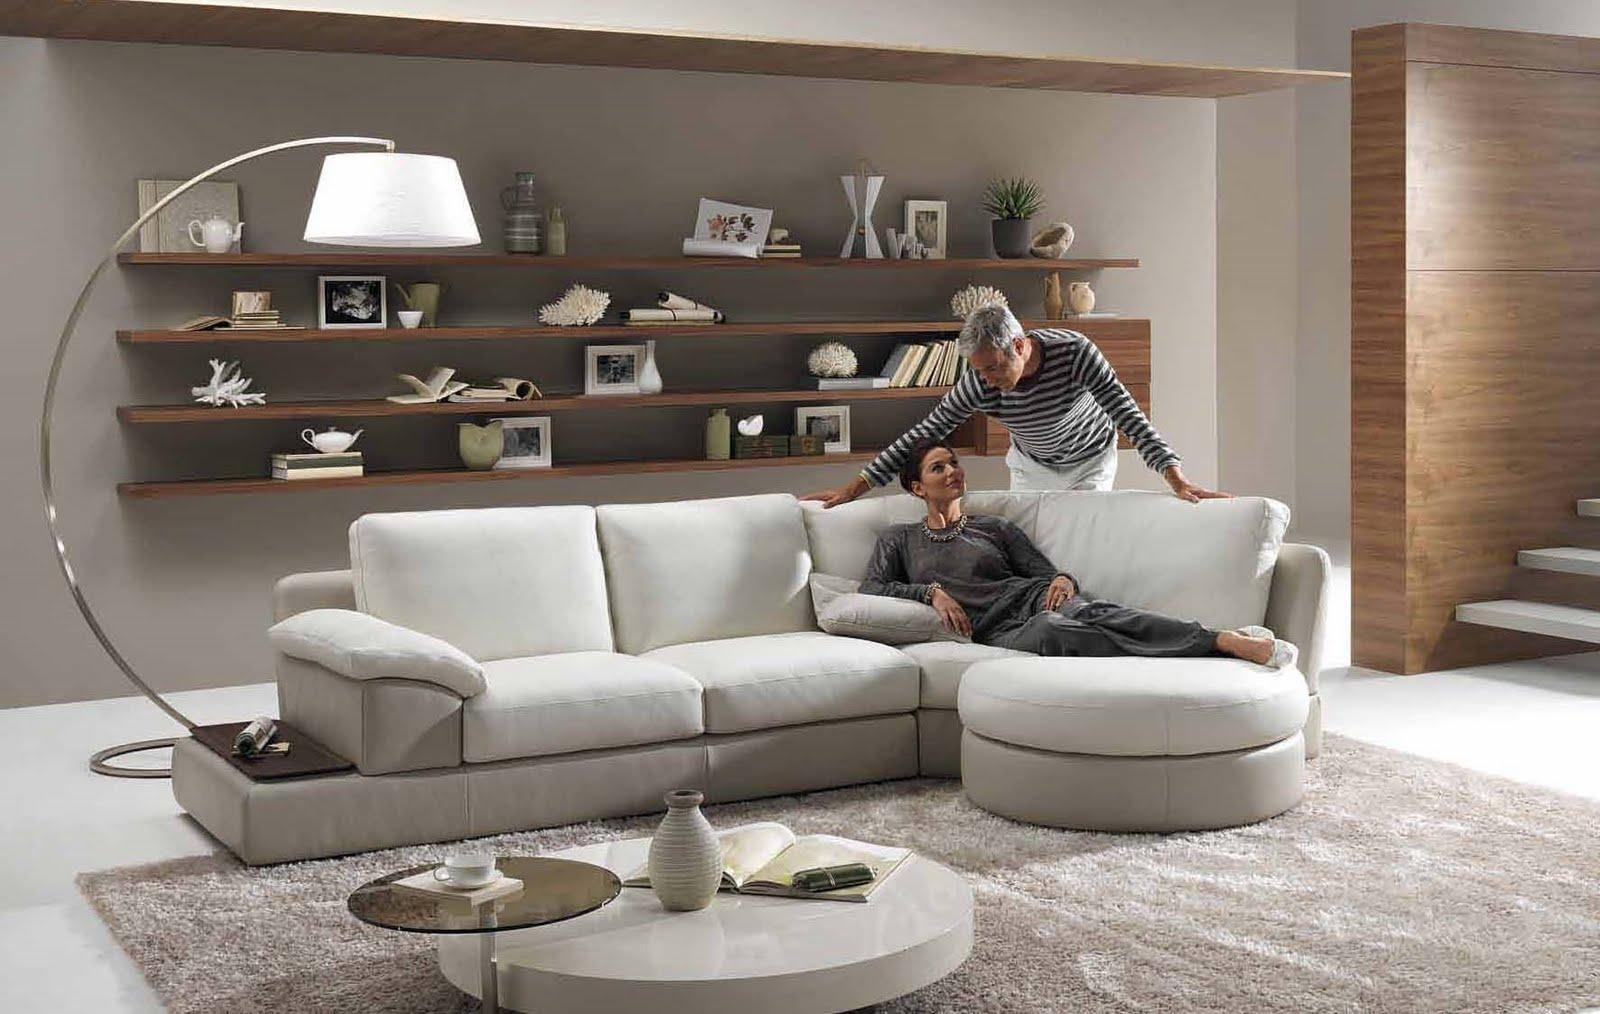 small drawing room interior - Interior Design Living Room Ideas